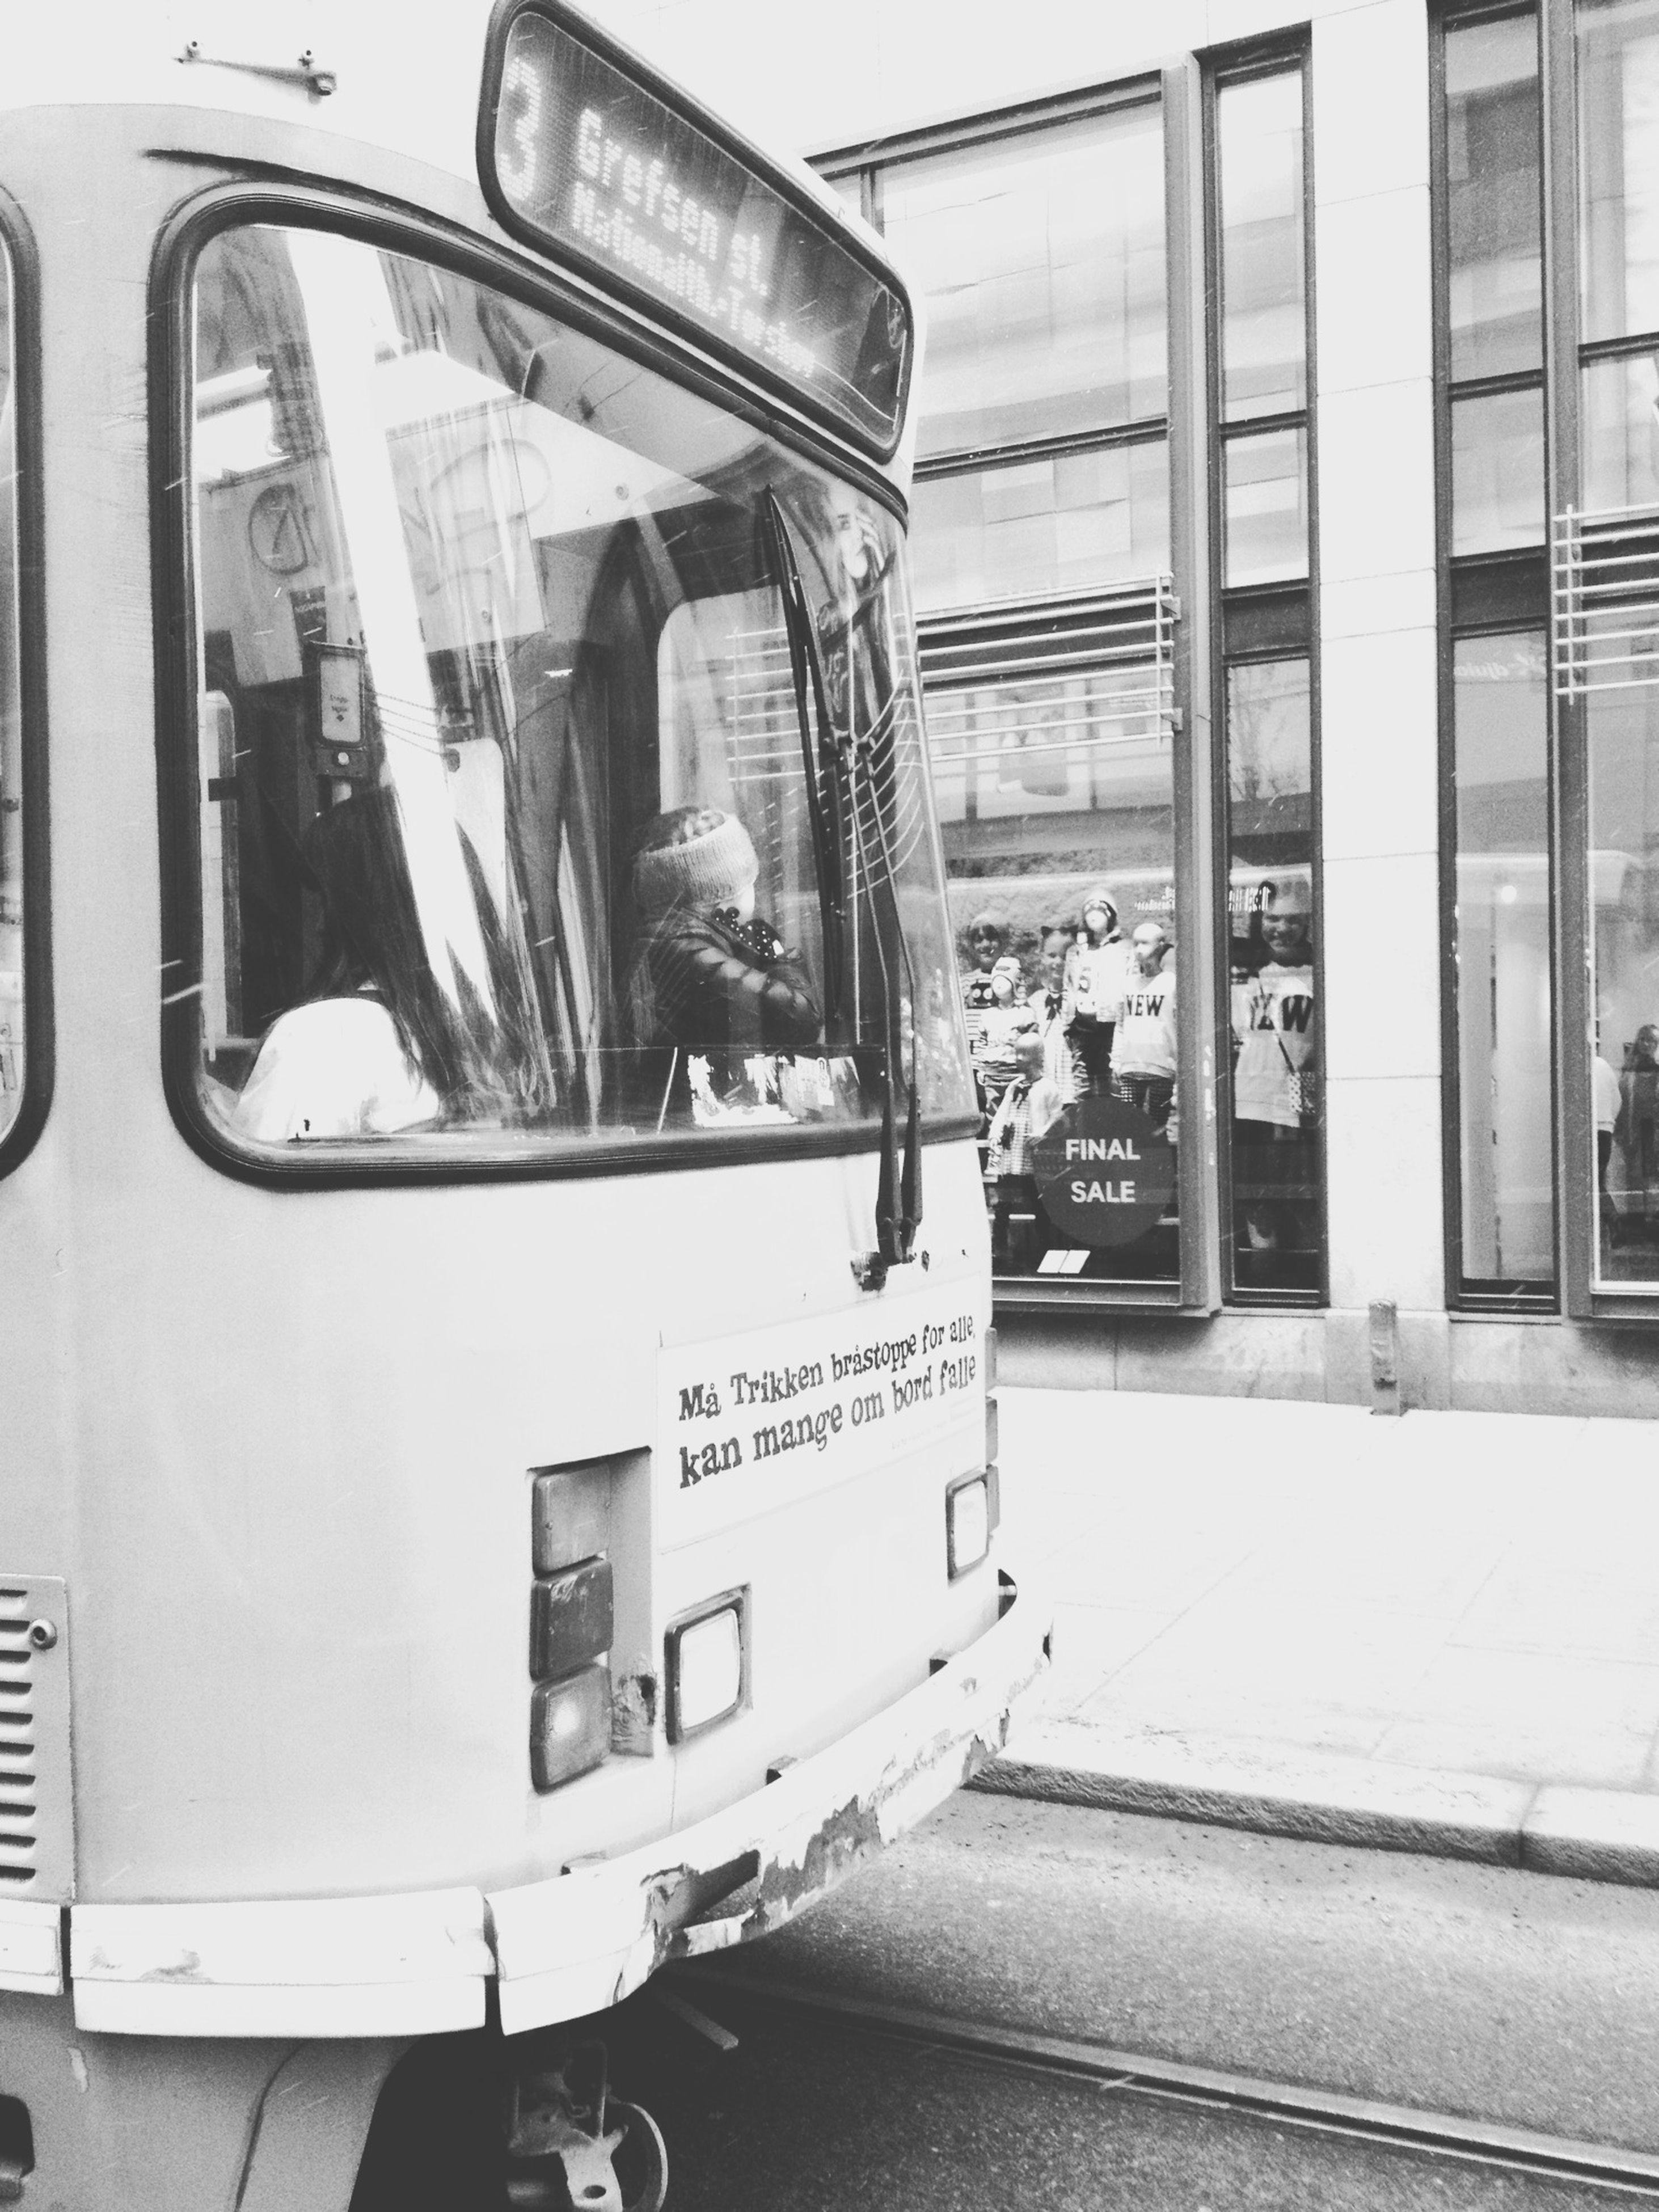 transportation, public transportation, mode of transport, architecture, window, built structure, glass - material, men, land vehicle, building exterior, city, rail transportation, person, train - vehicle, travel, incidental people, railroad station, city life, indoors